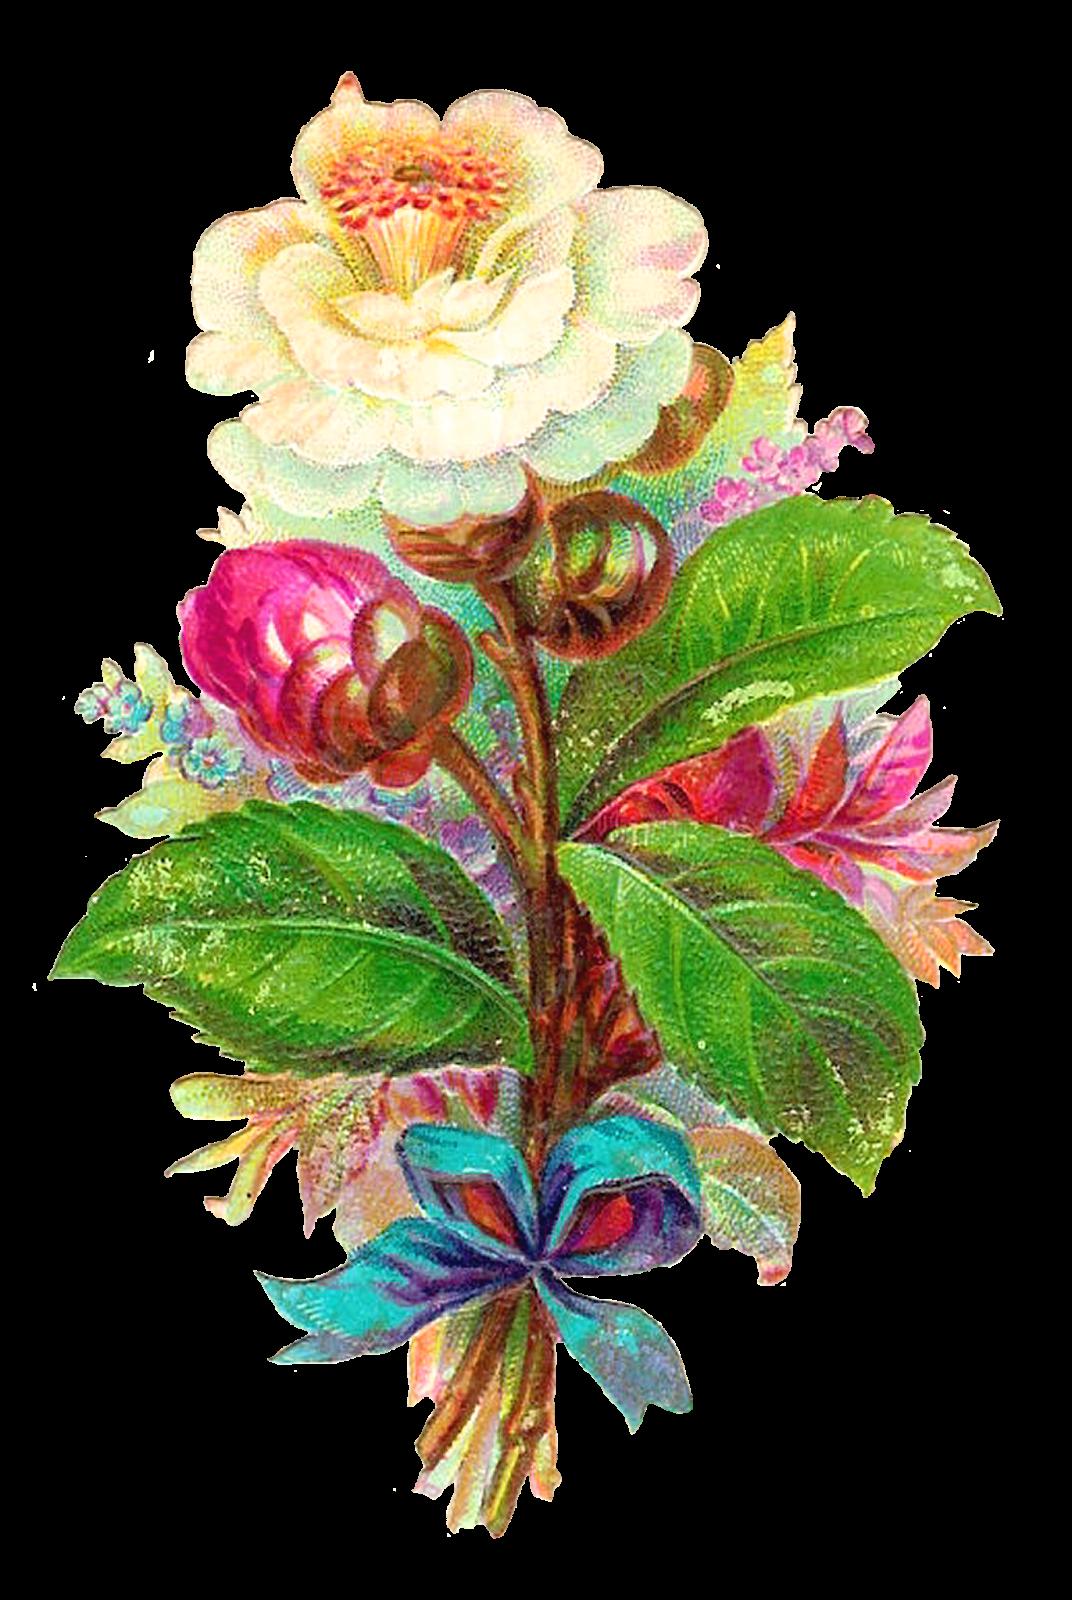 Download flower photos png freeuse stock Antique Images: Digital Flower White Camellia Vintage Clip Art ... png freeuse stock